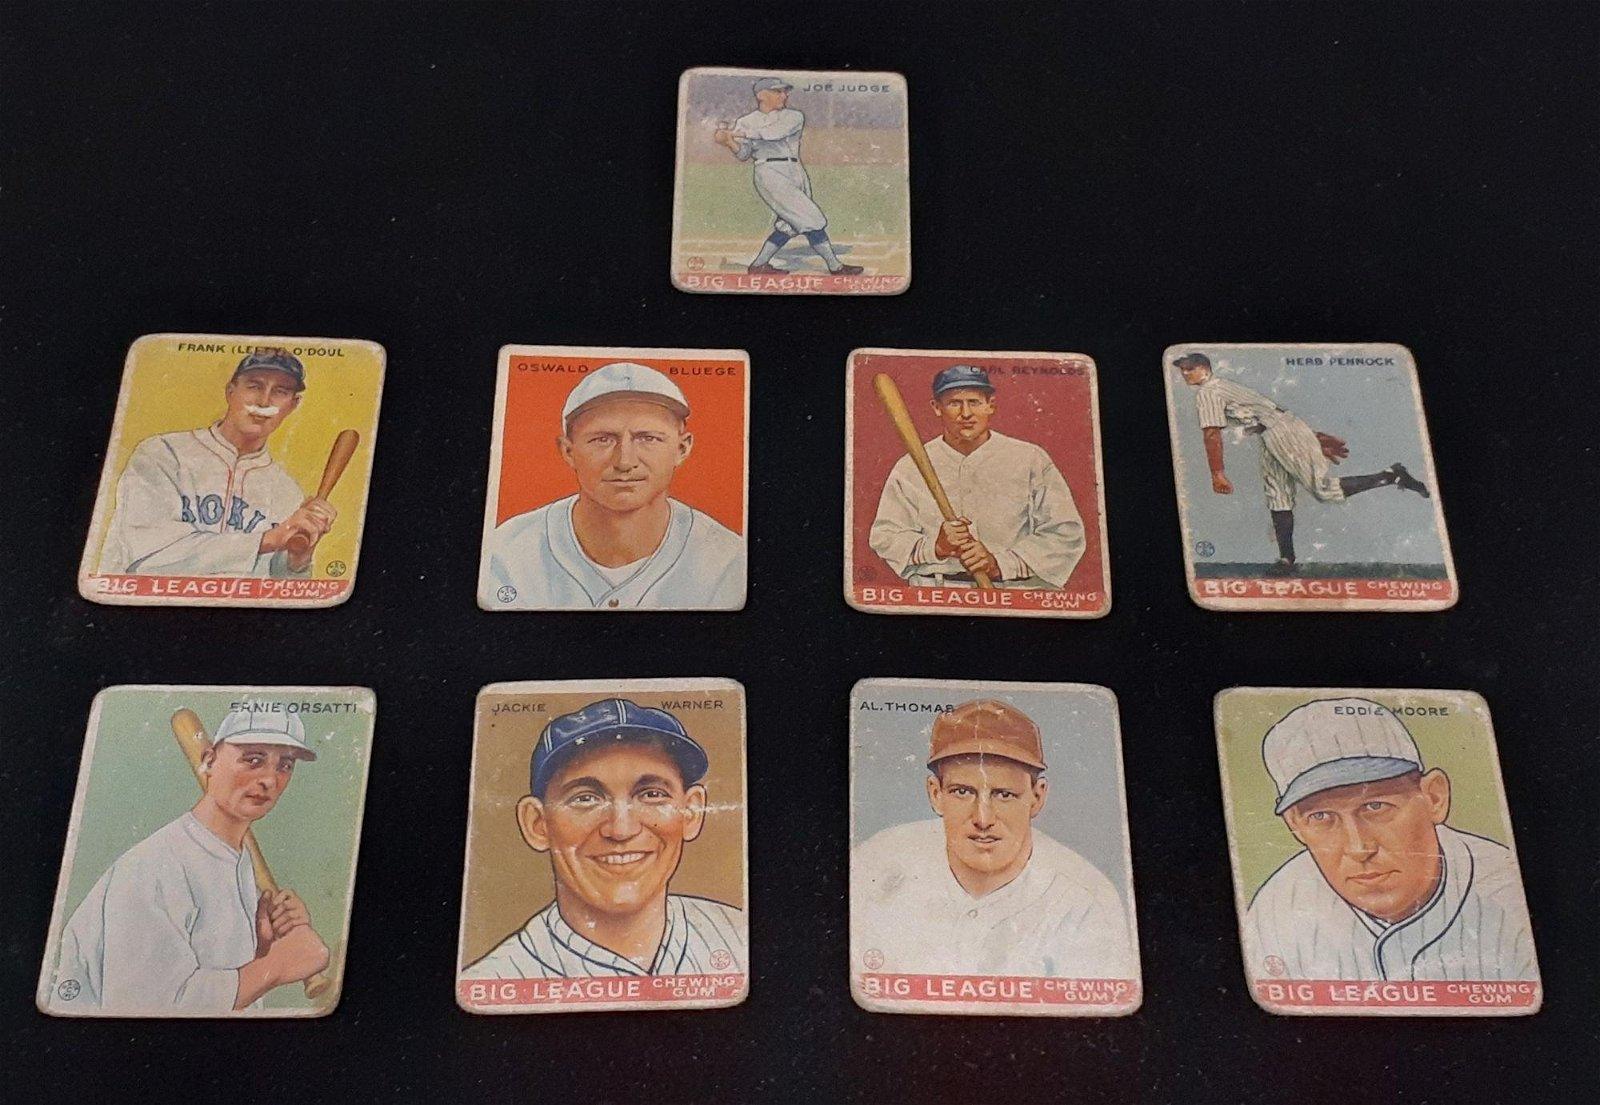 (10) 1933 GOUDEY BIG LEAGUE BASEBALL CARDS: 58. FRANK